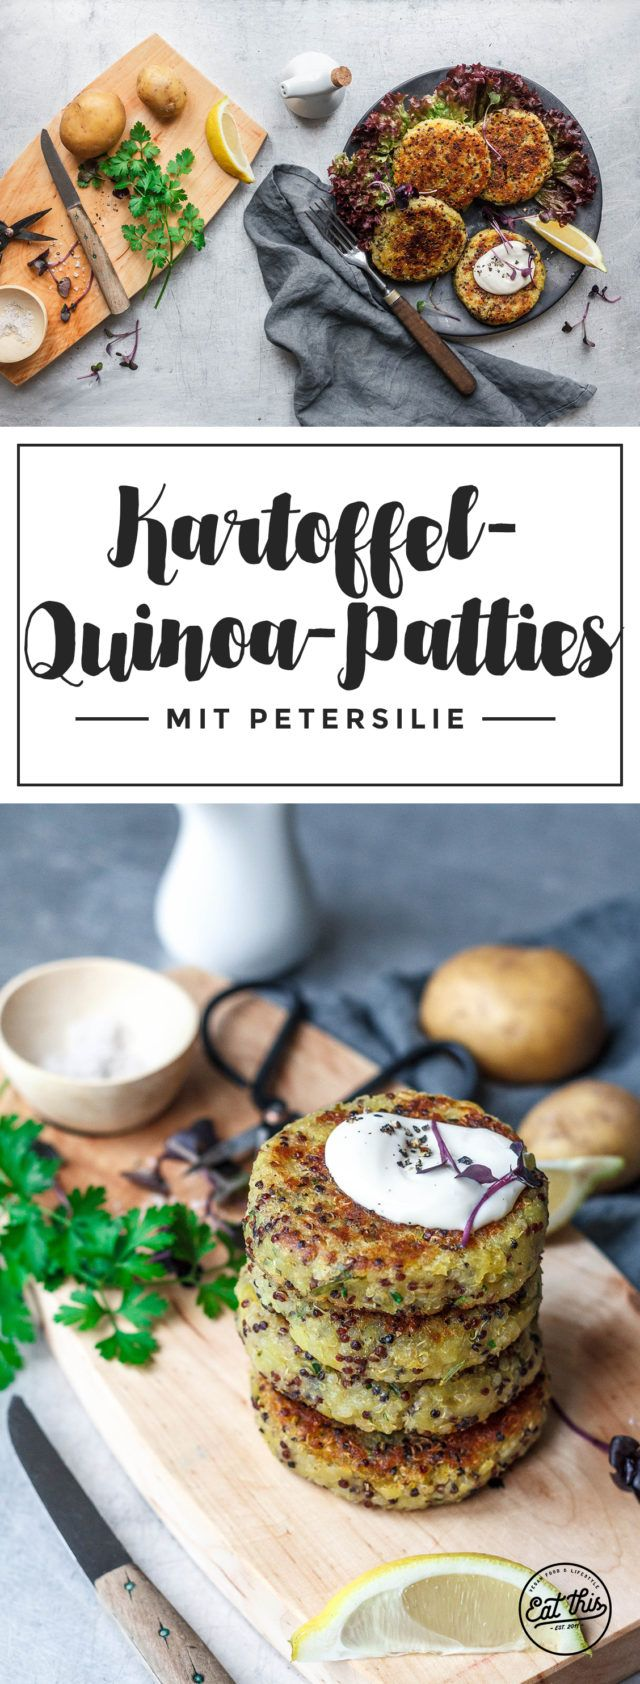 Photo of Simple Potato Quinoa Patties · Eat this! Food blog • Vegan recipes • Stories